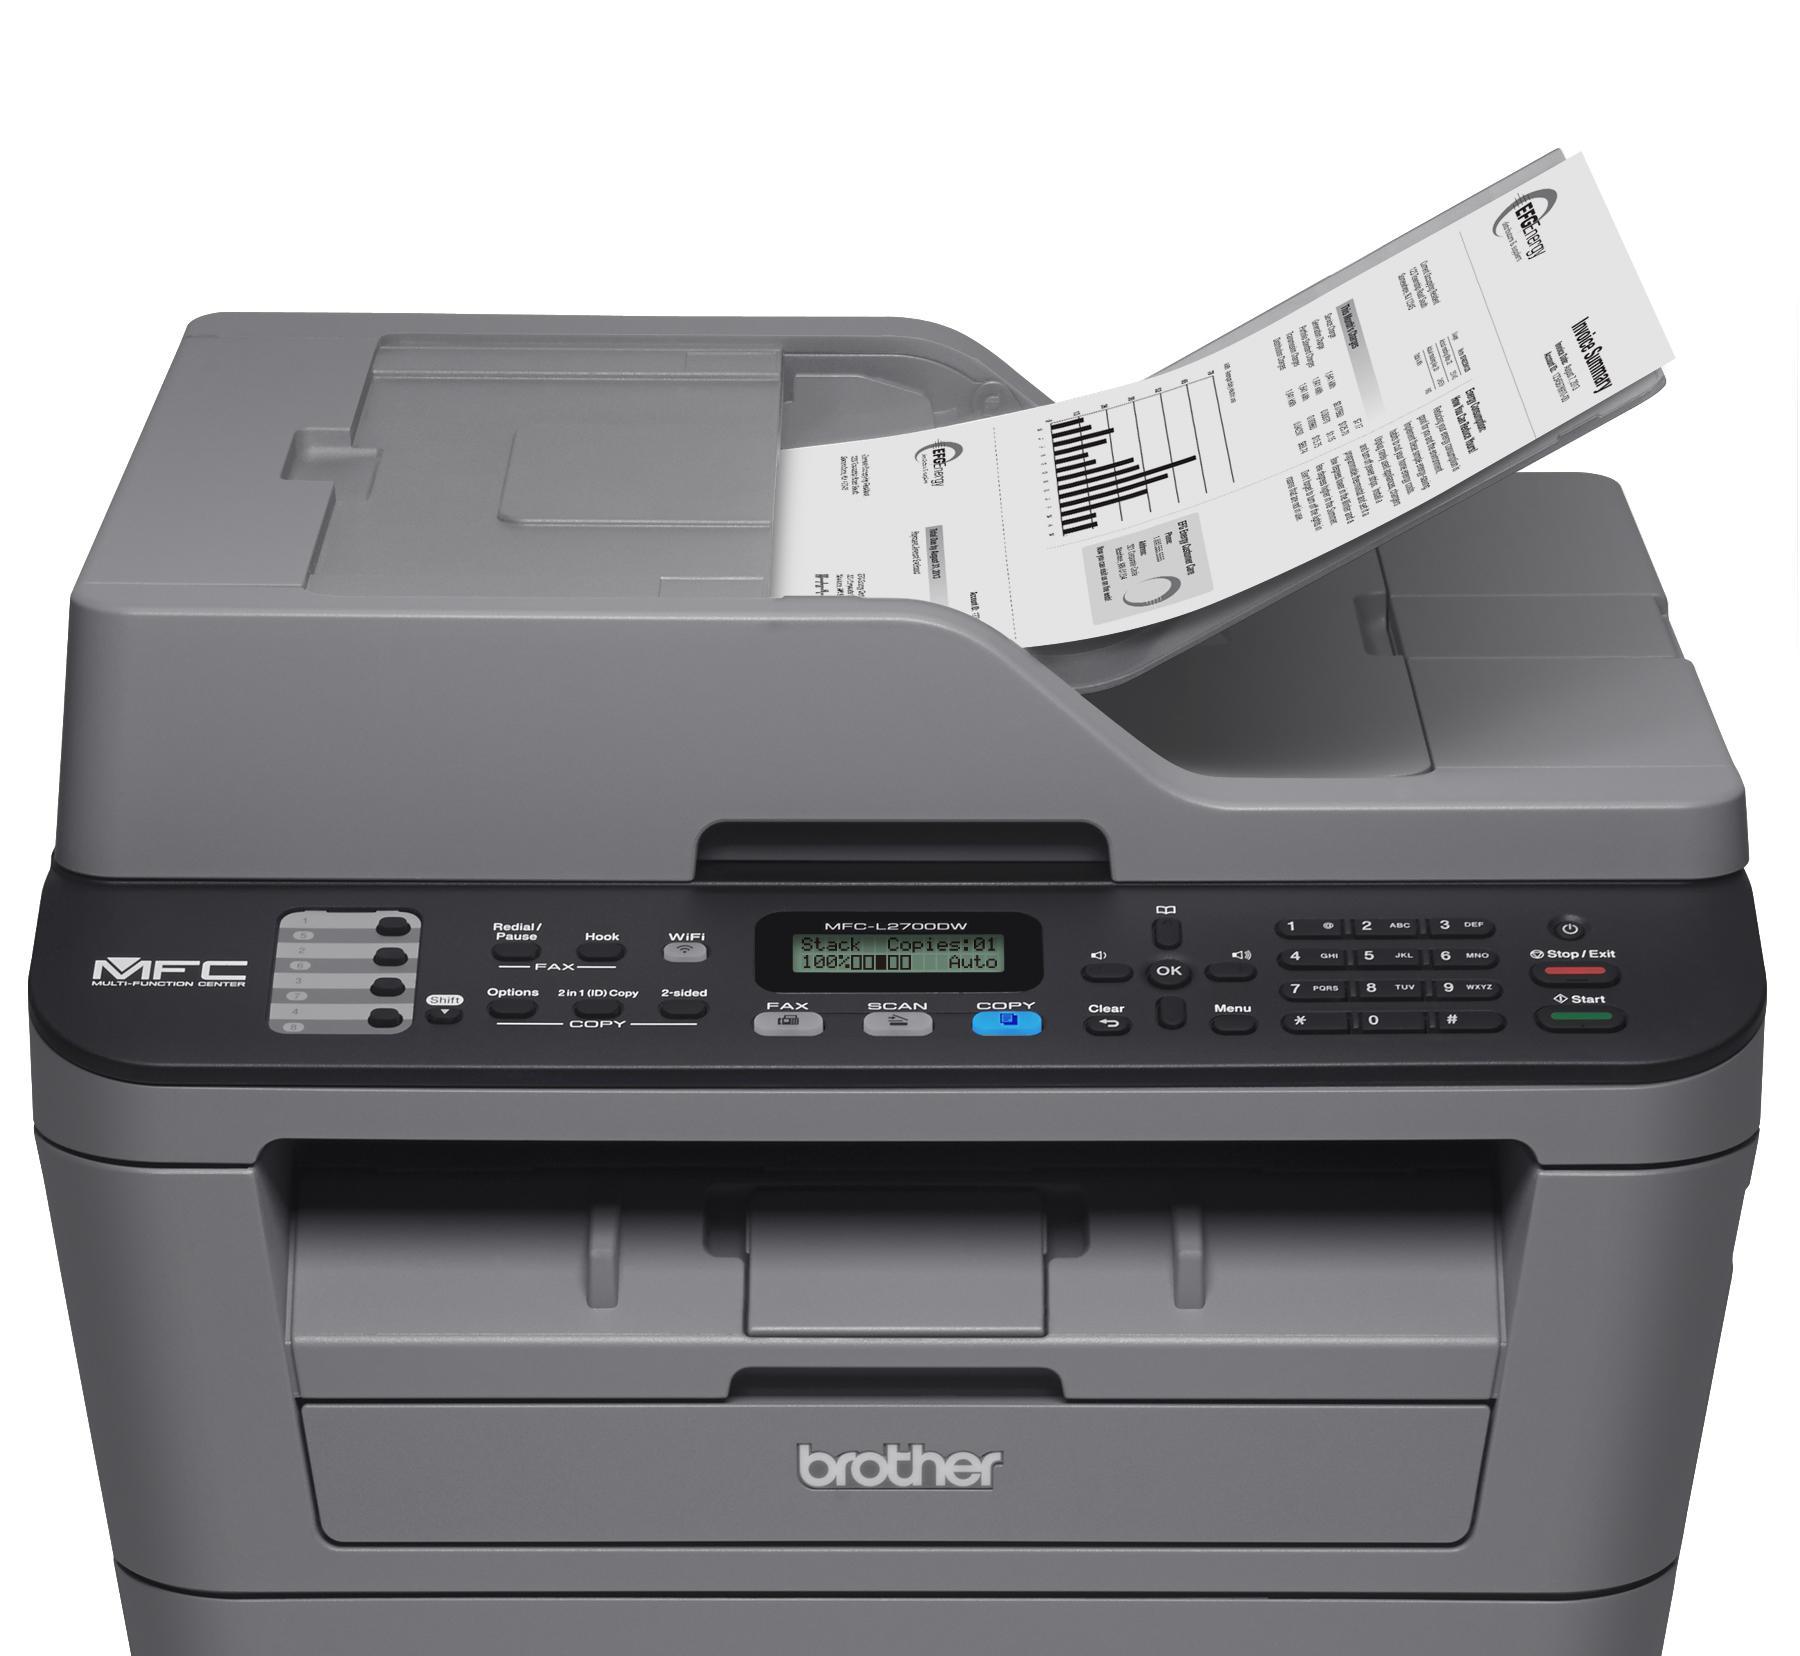 Impresora Brother MFC-L2700 DW